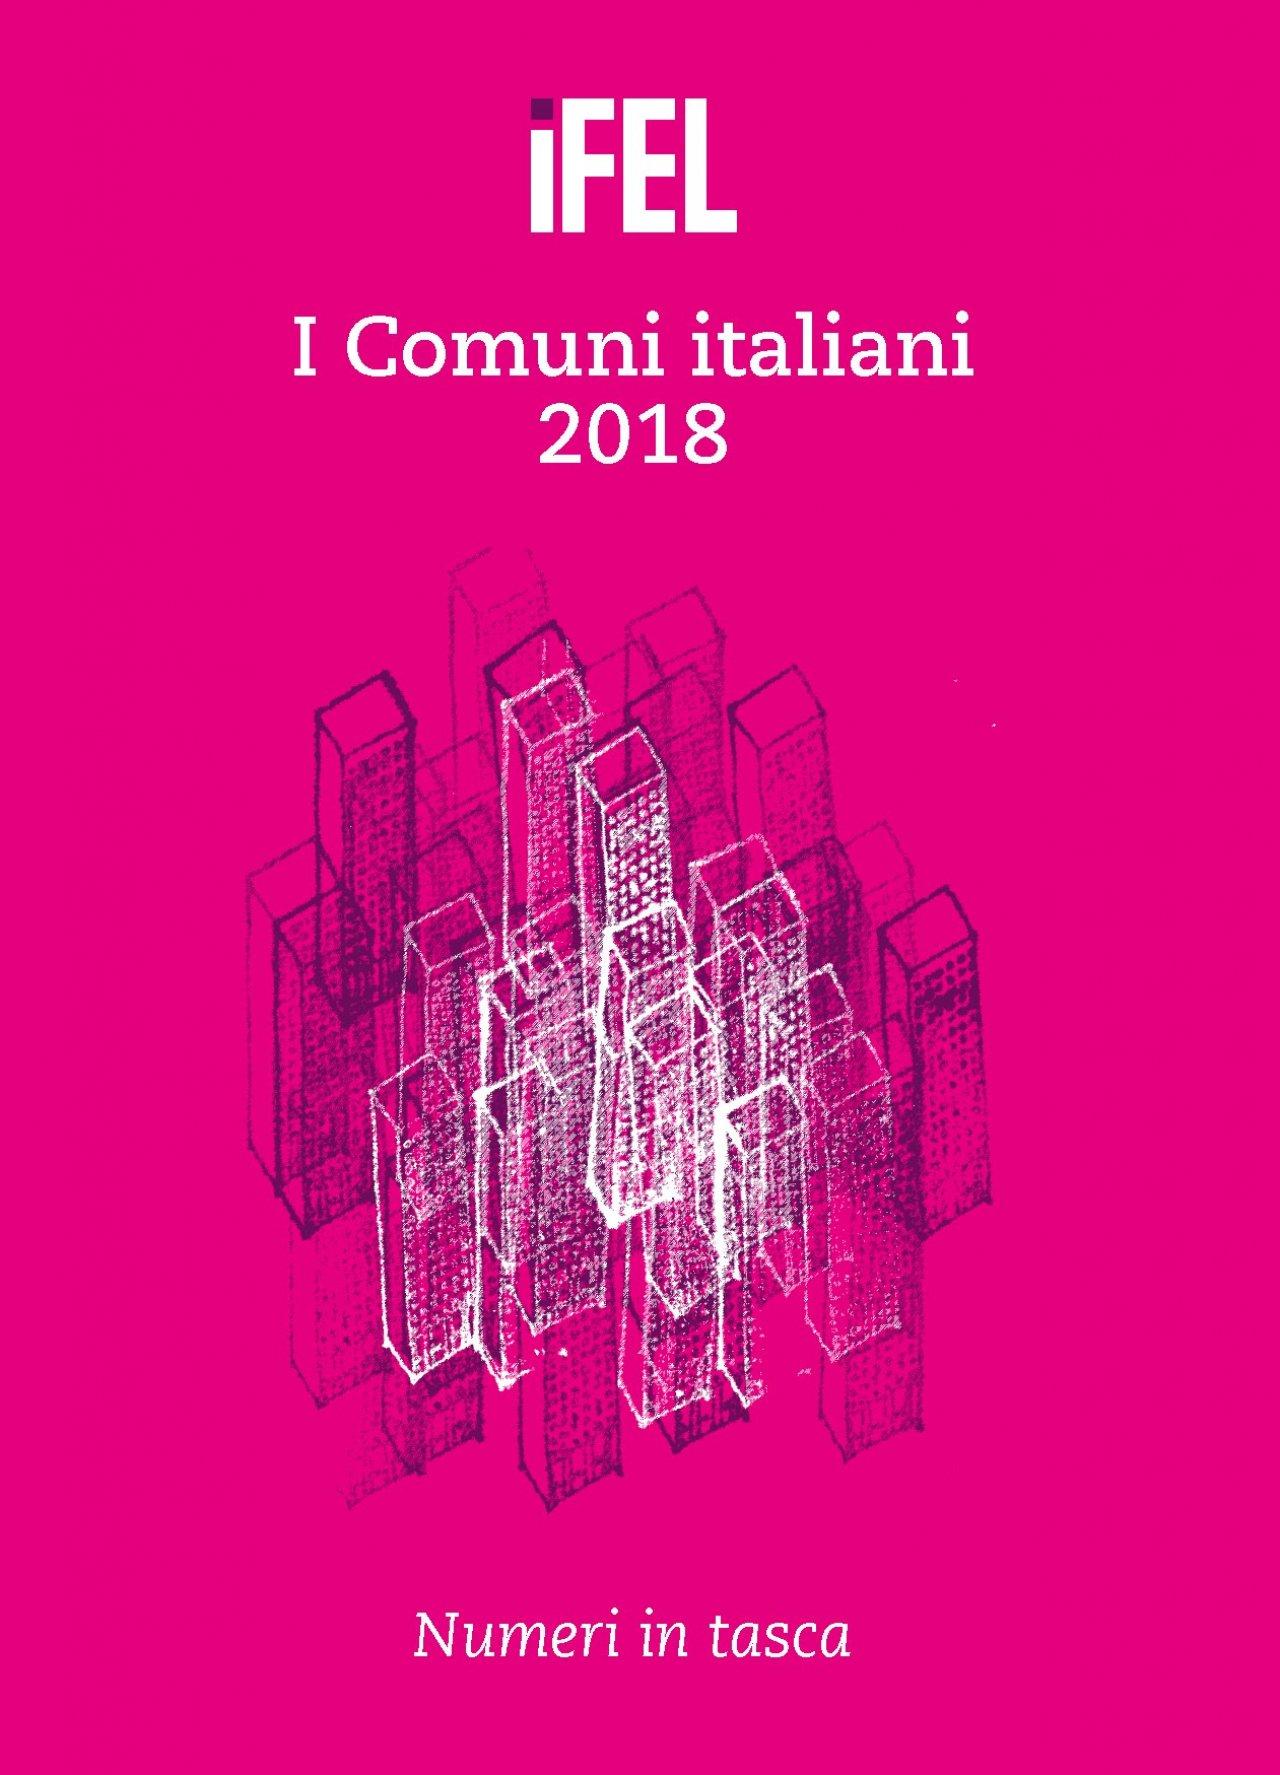 I Comuni italiani 2018 - Numeri in tasca